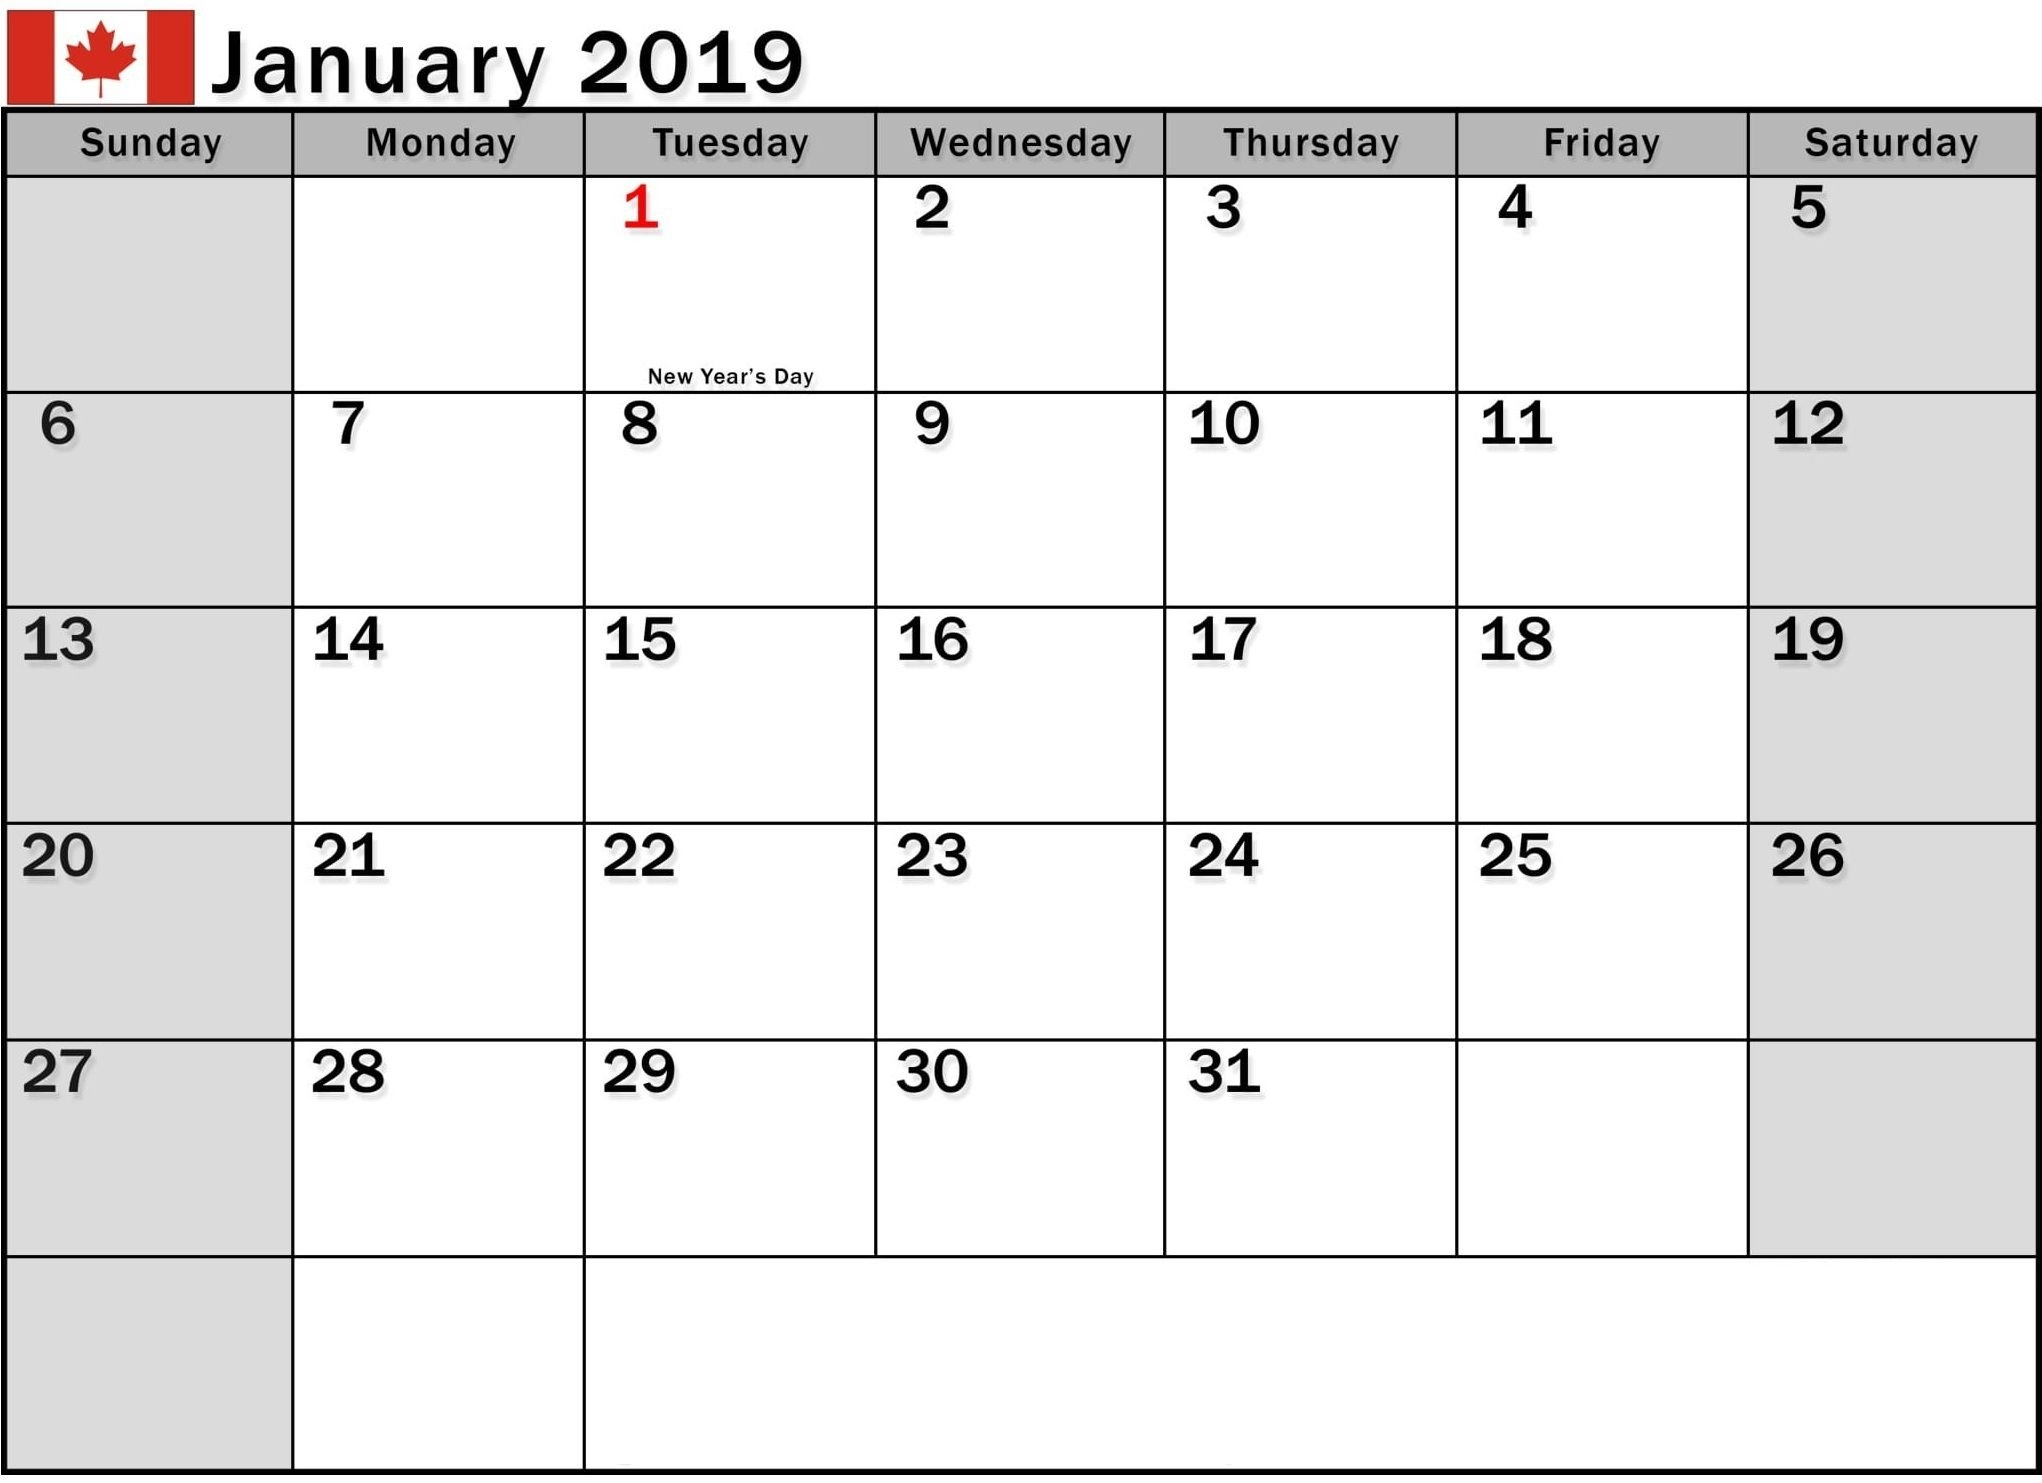 January 2019 Calendar Canada Printable | 150+ January 2019 Calendar Calendar Of 2019 Canada